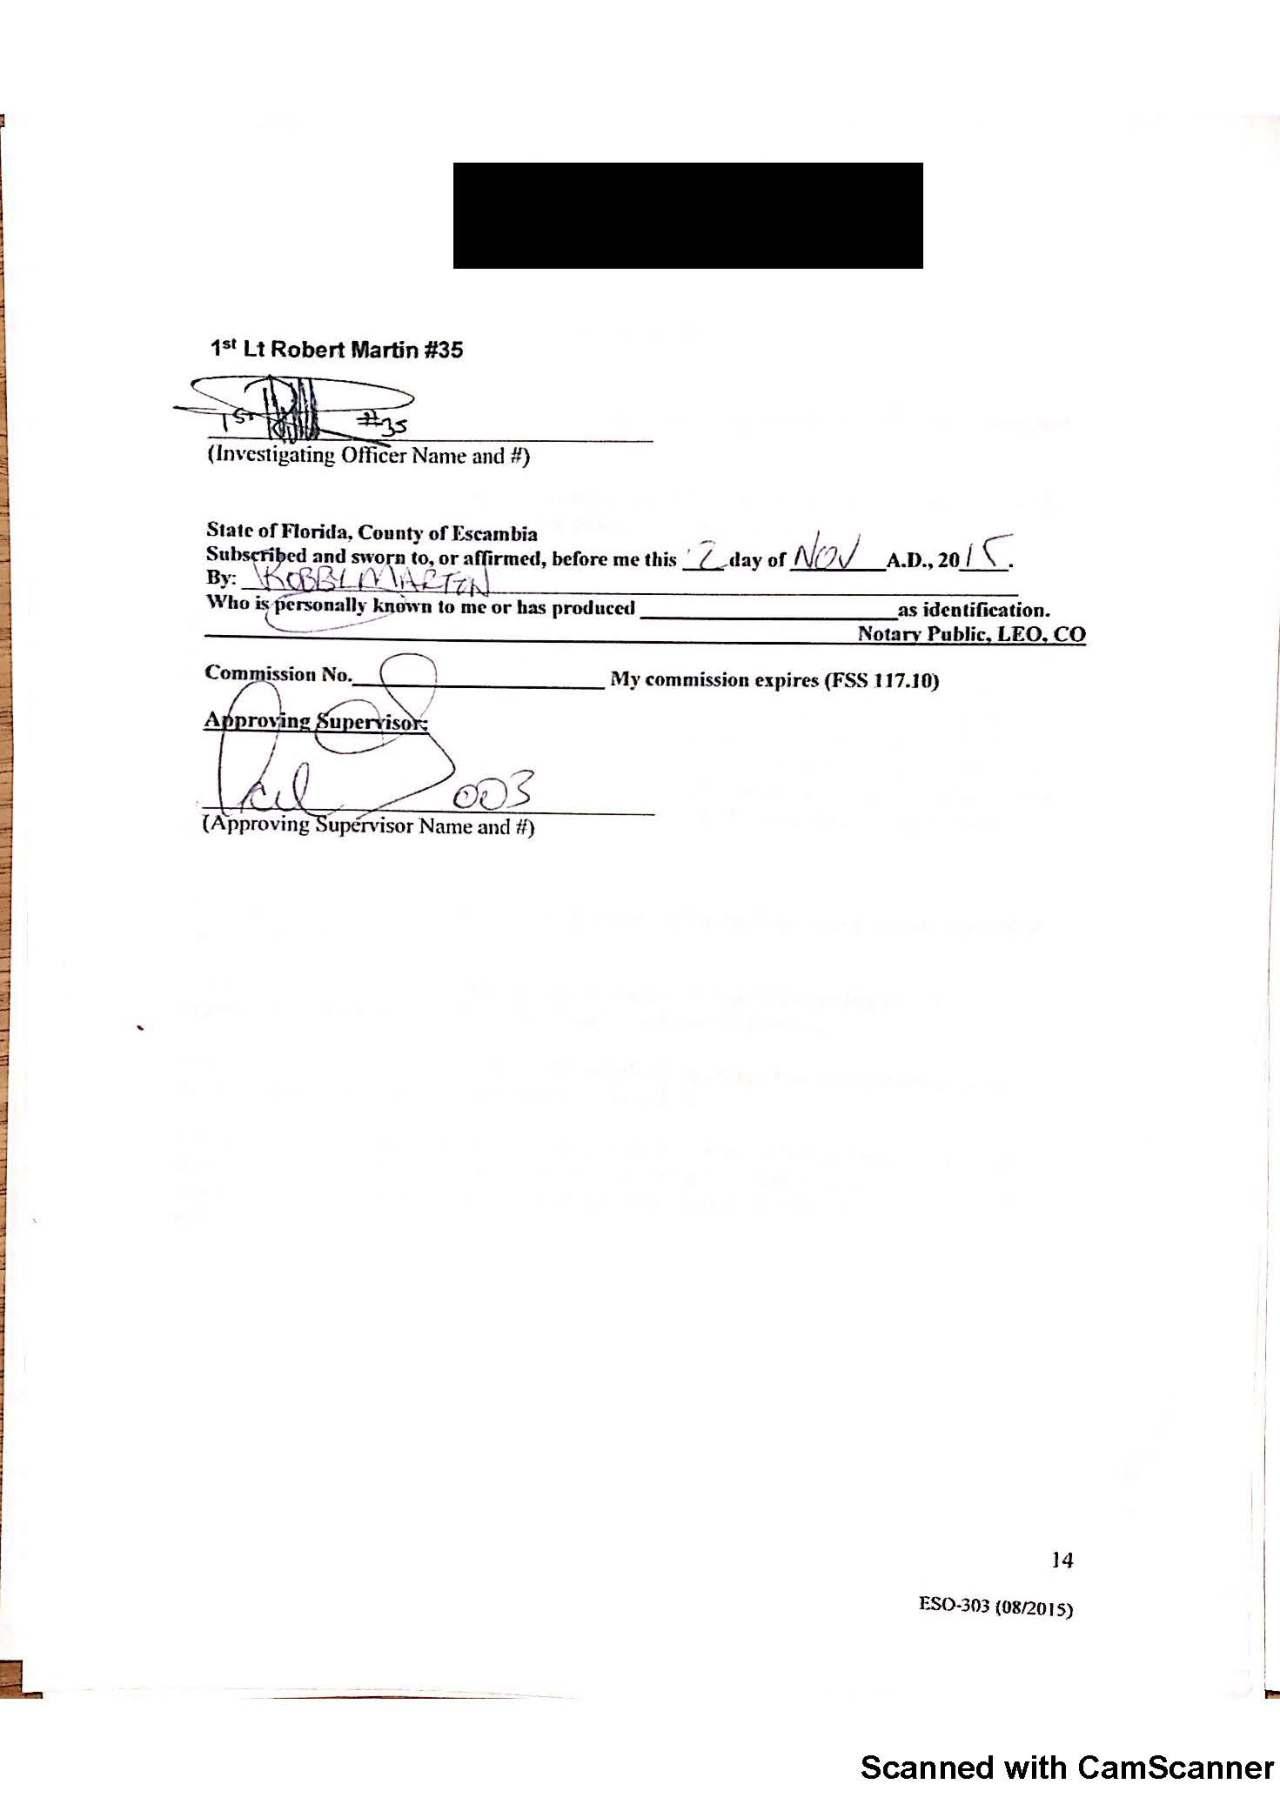 higdon investigation_Page_14